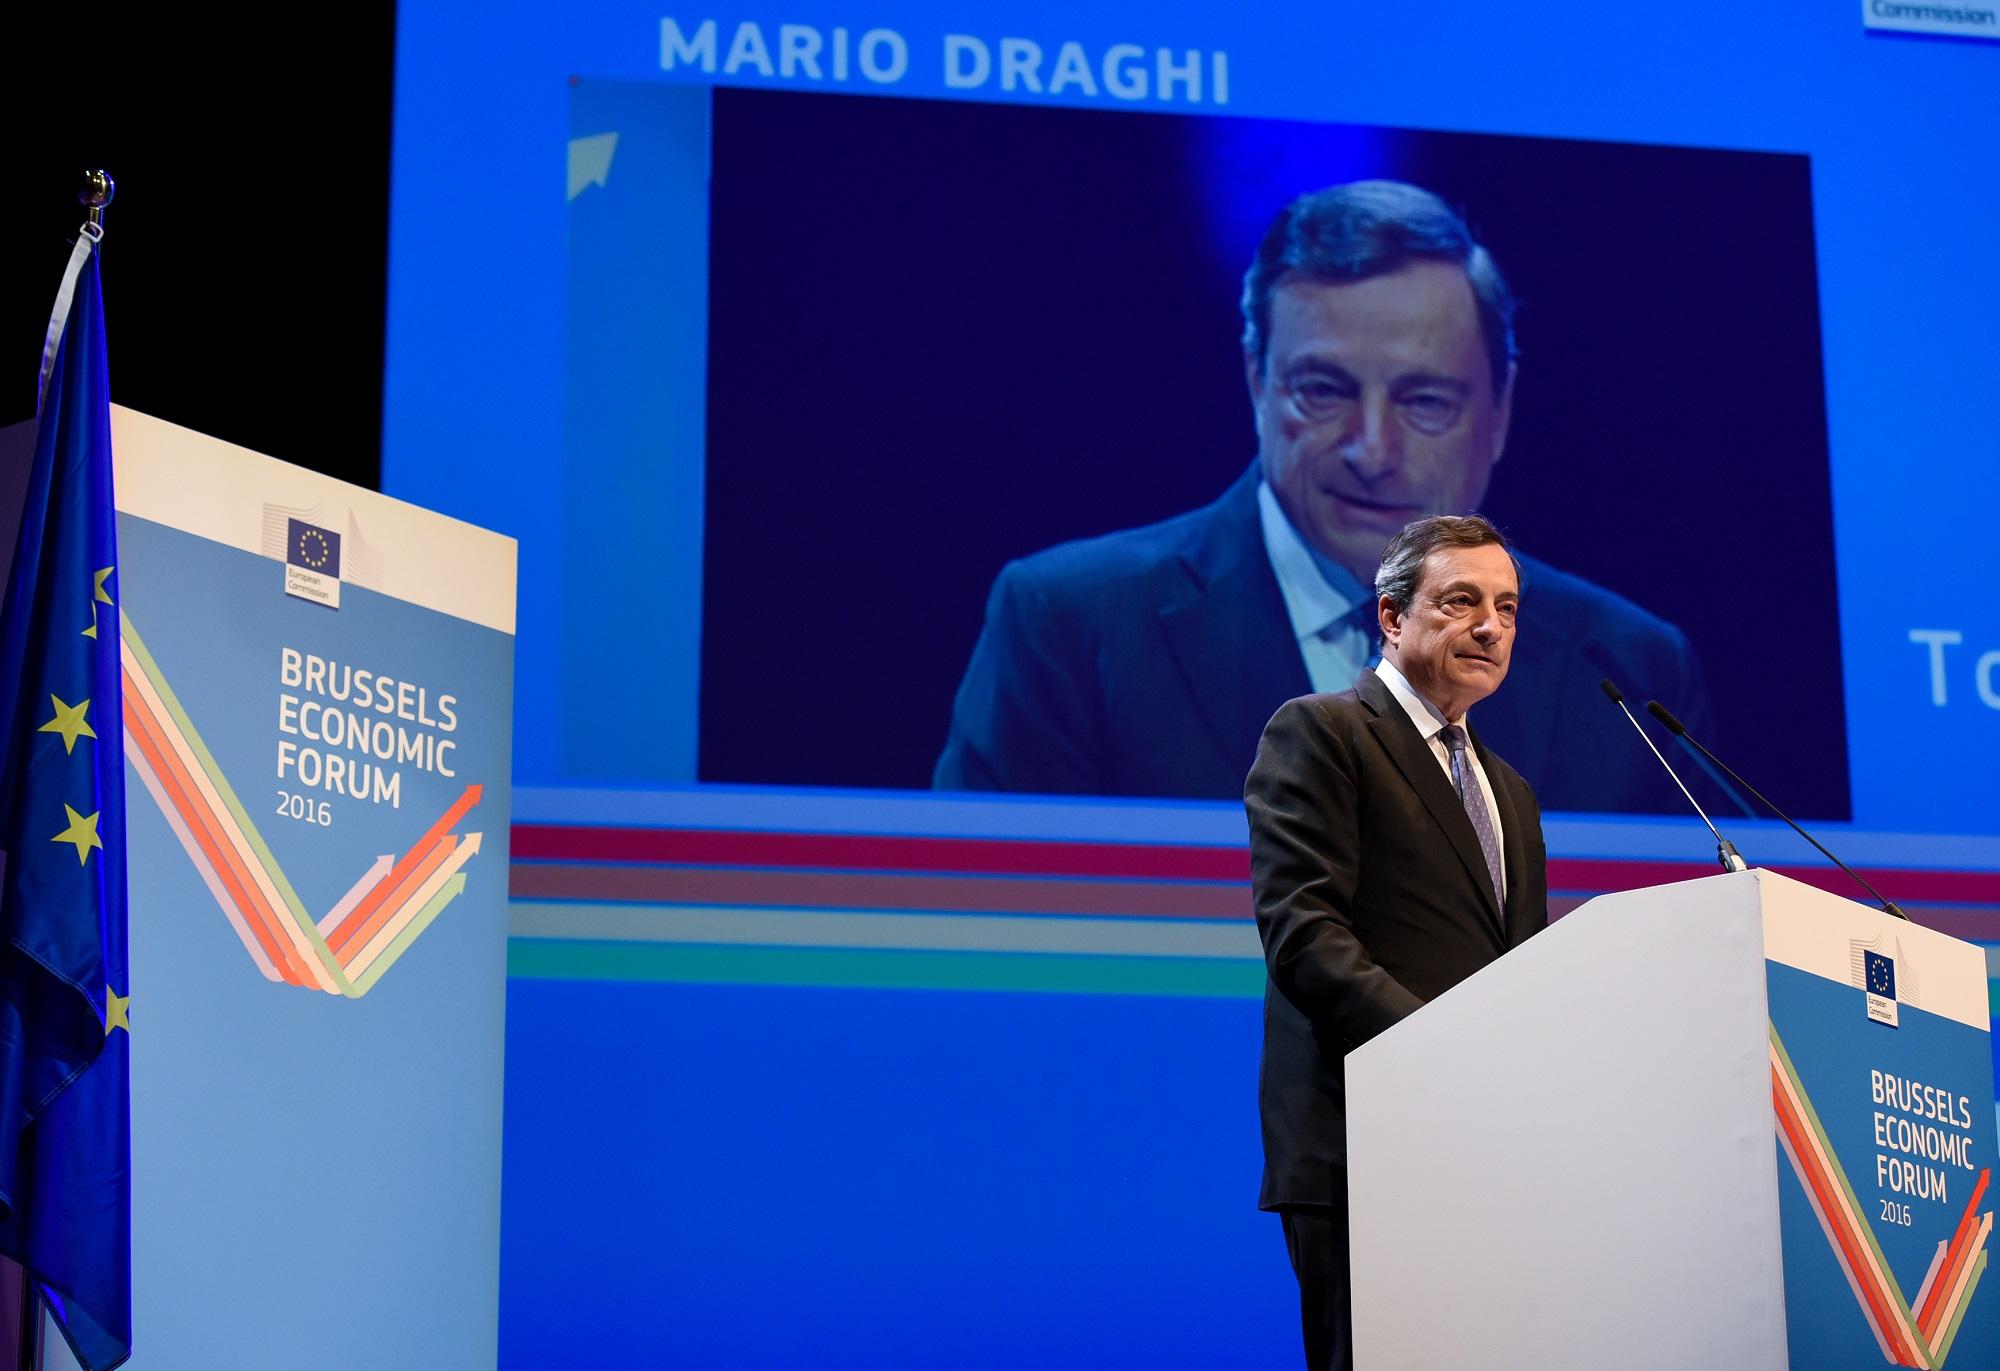 Mario Draghi at the podium